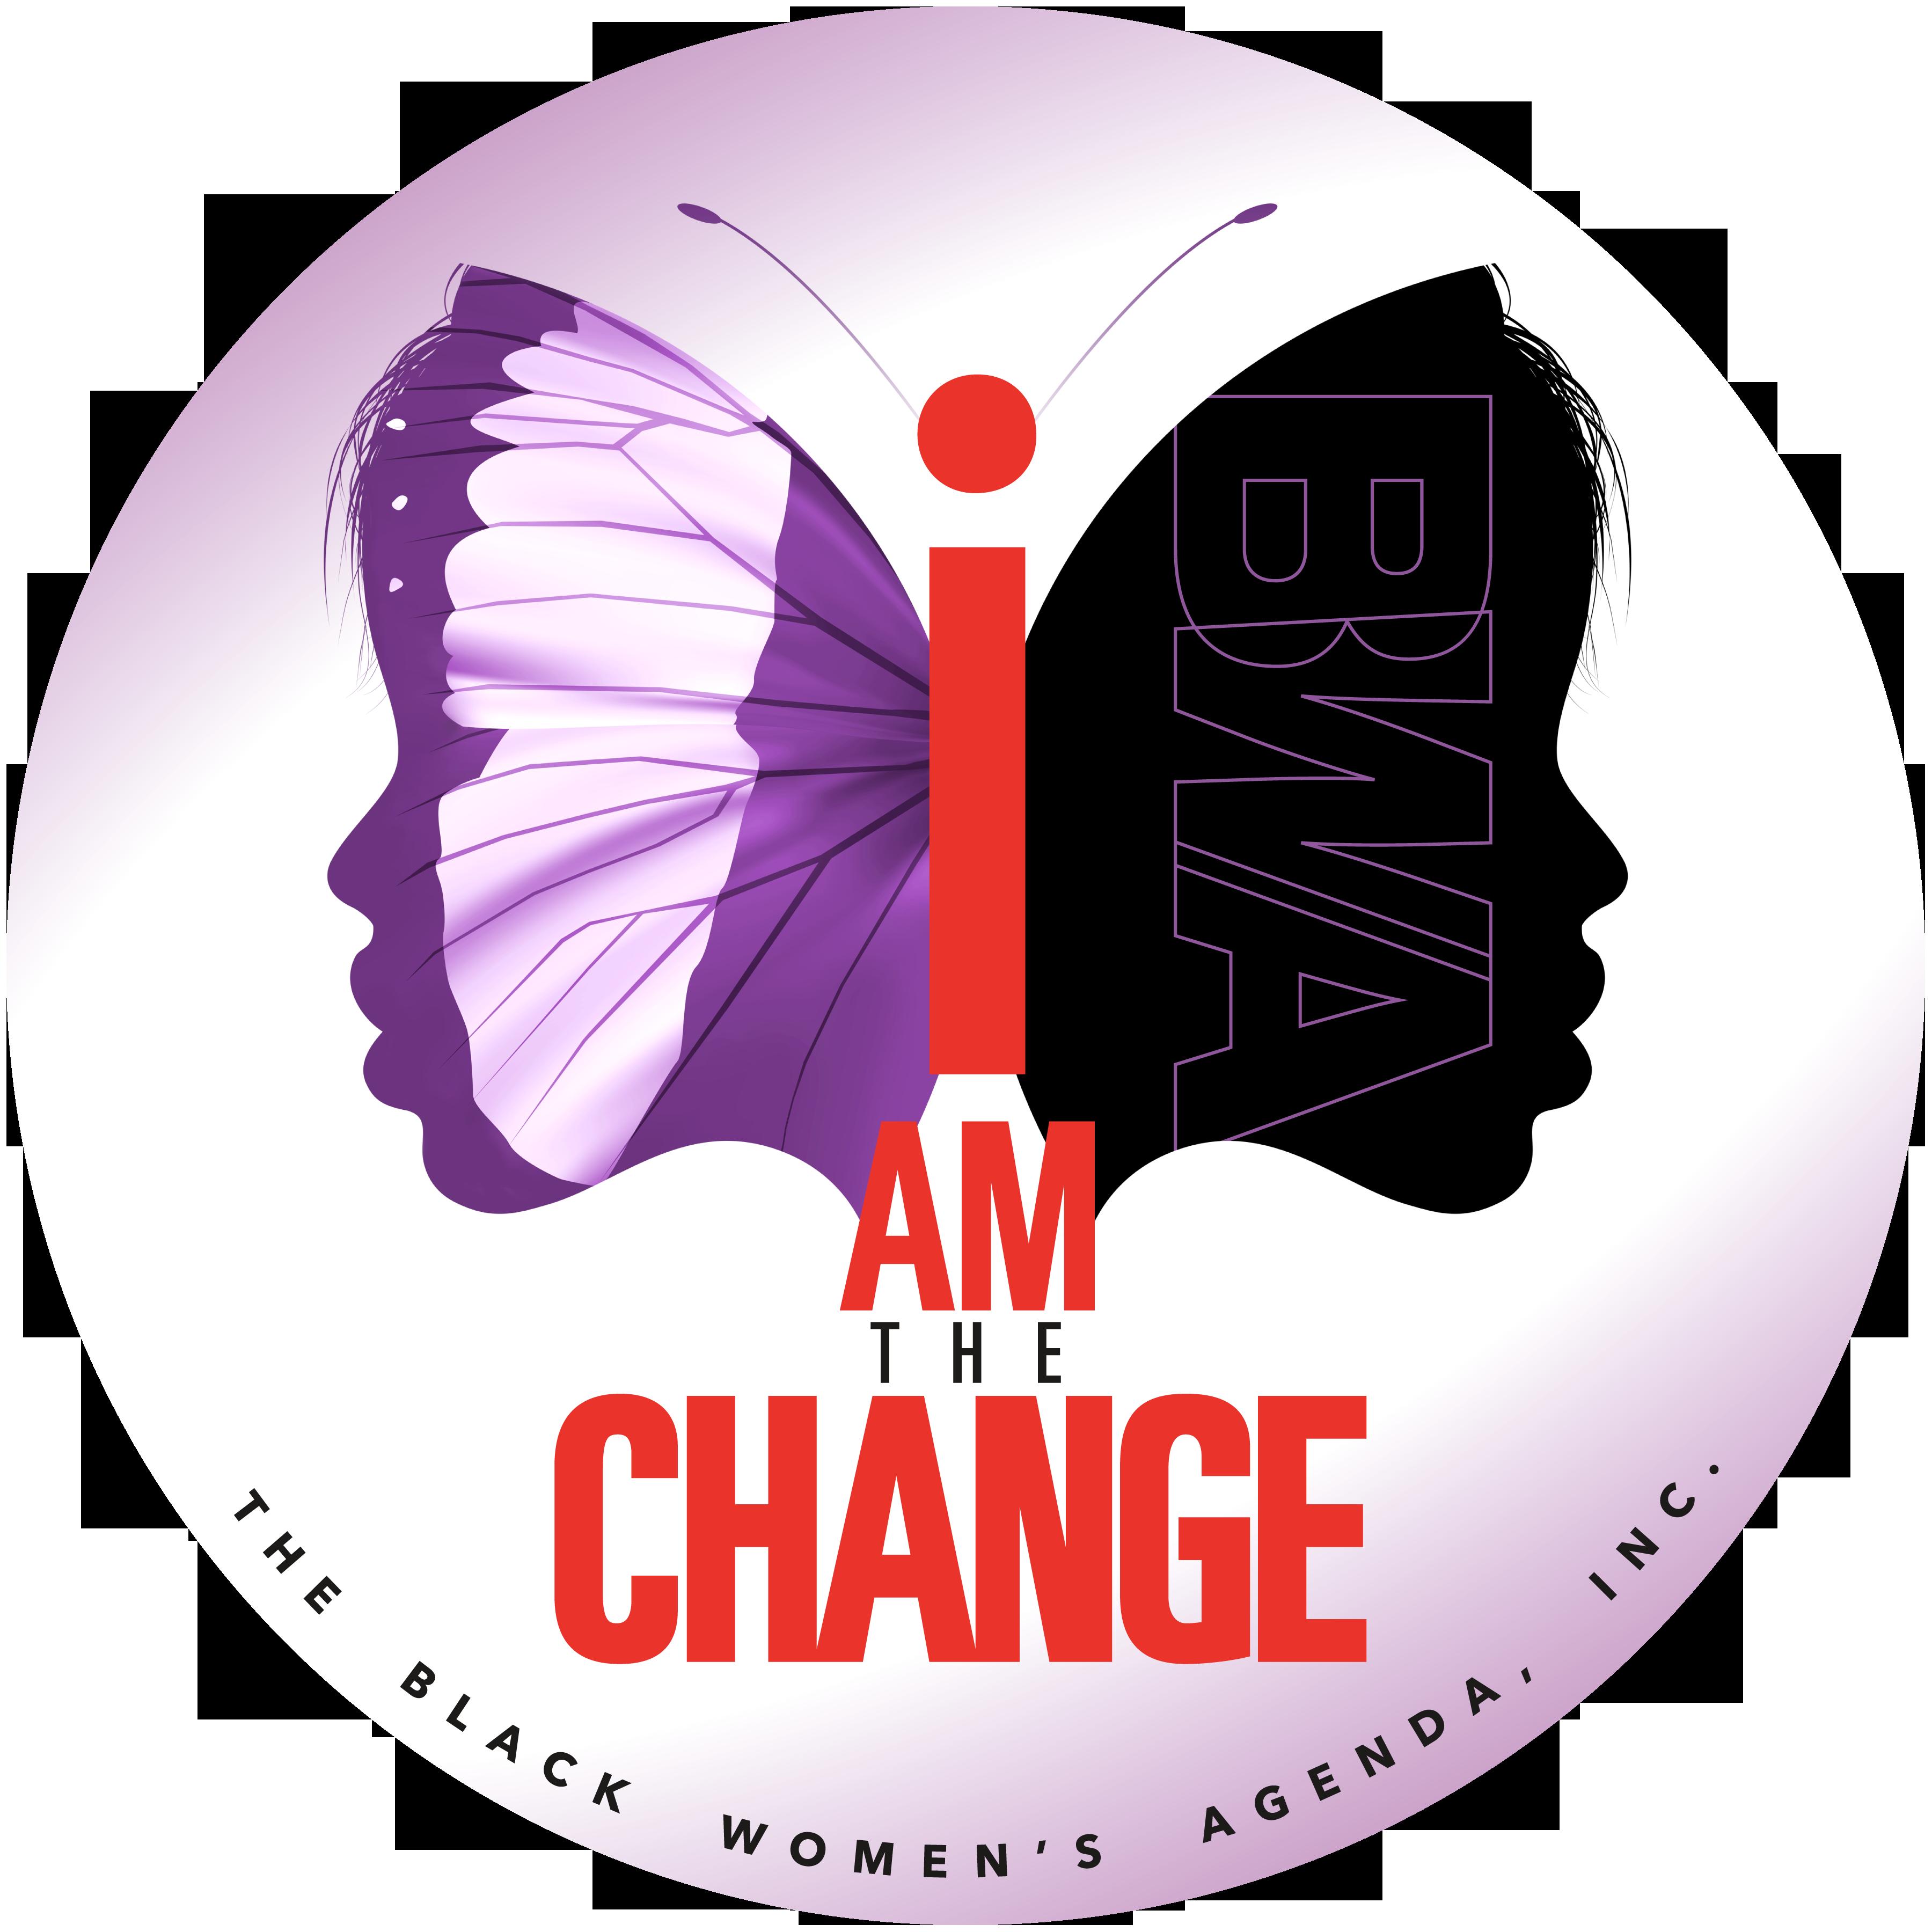 Black Women's Agenda